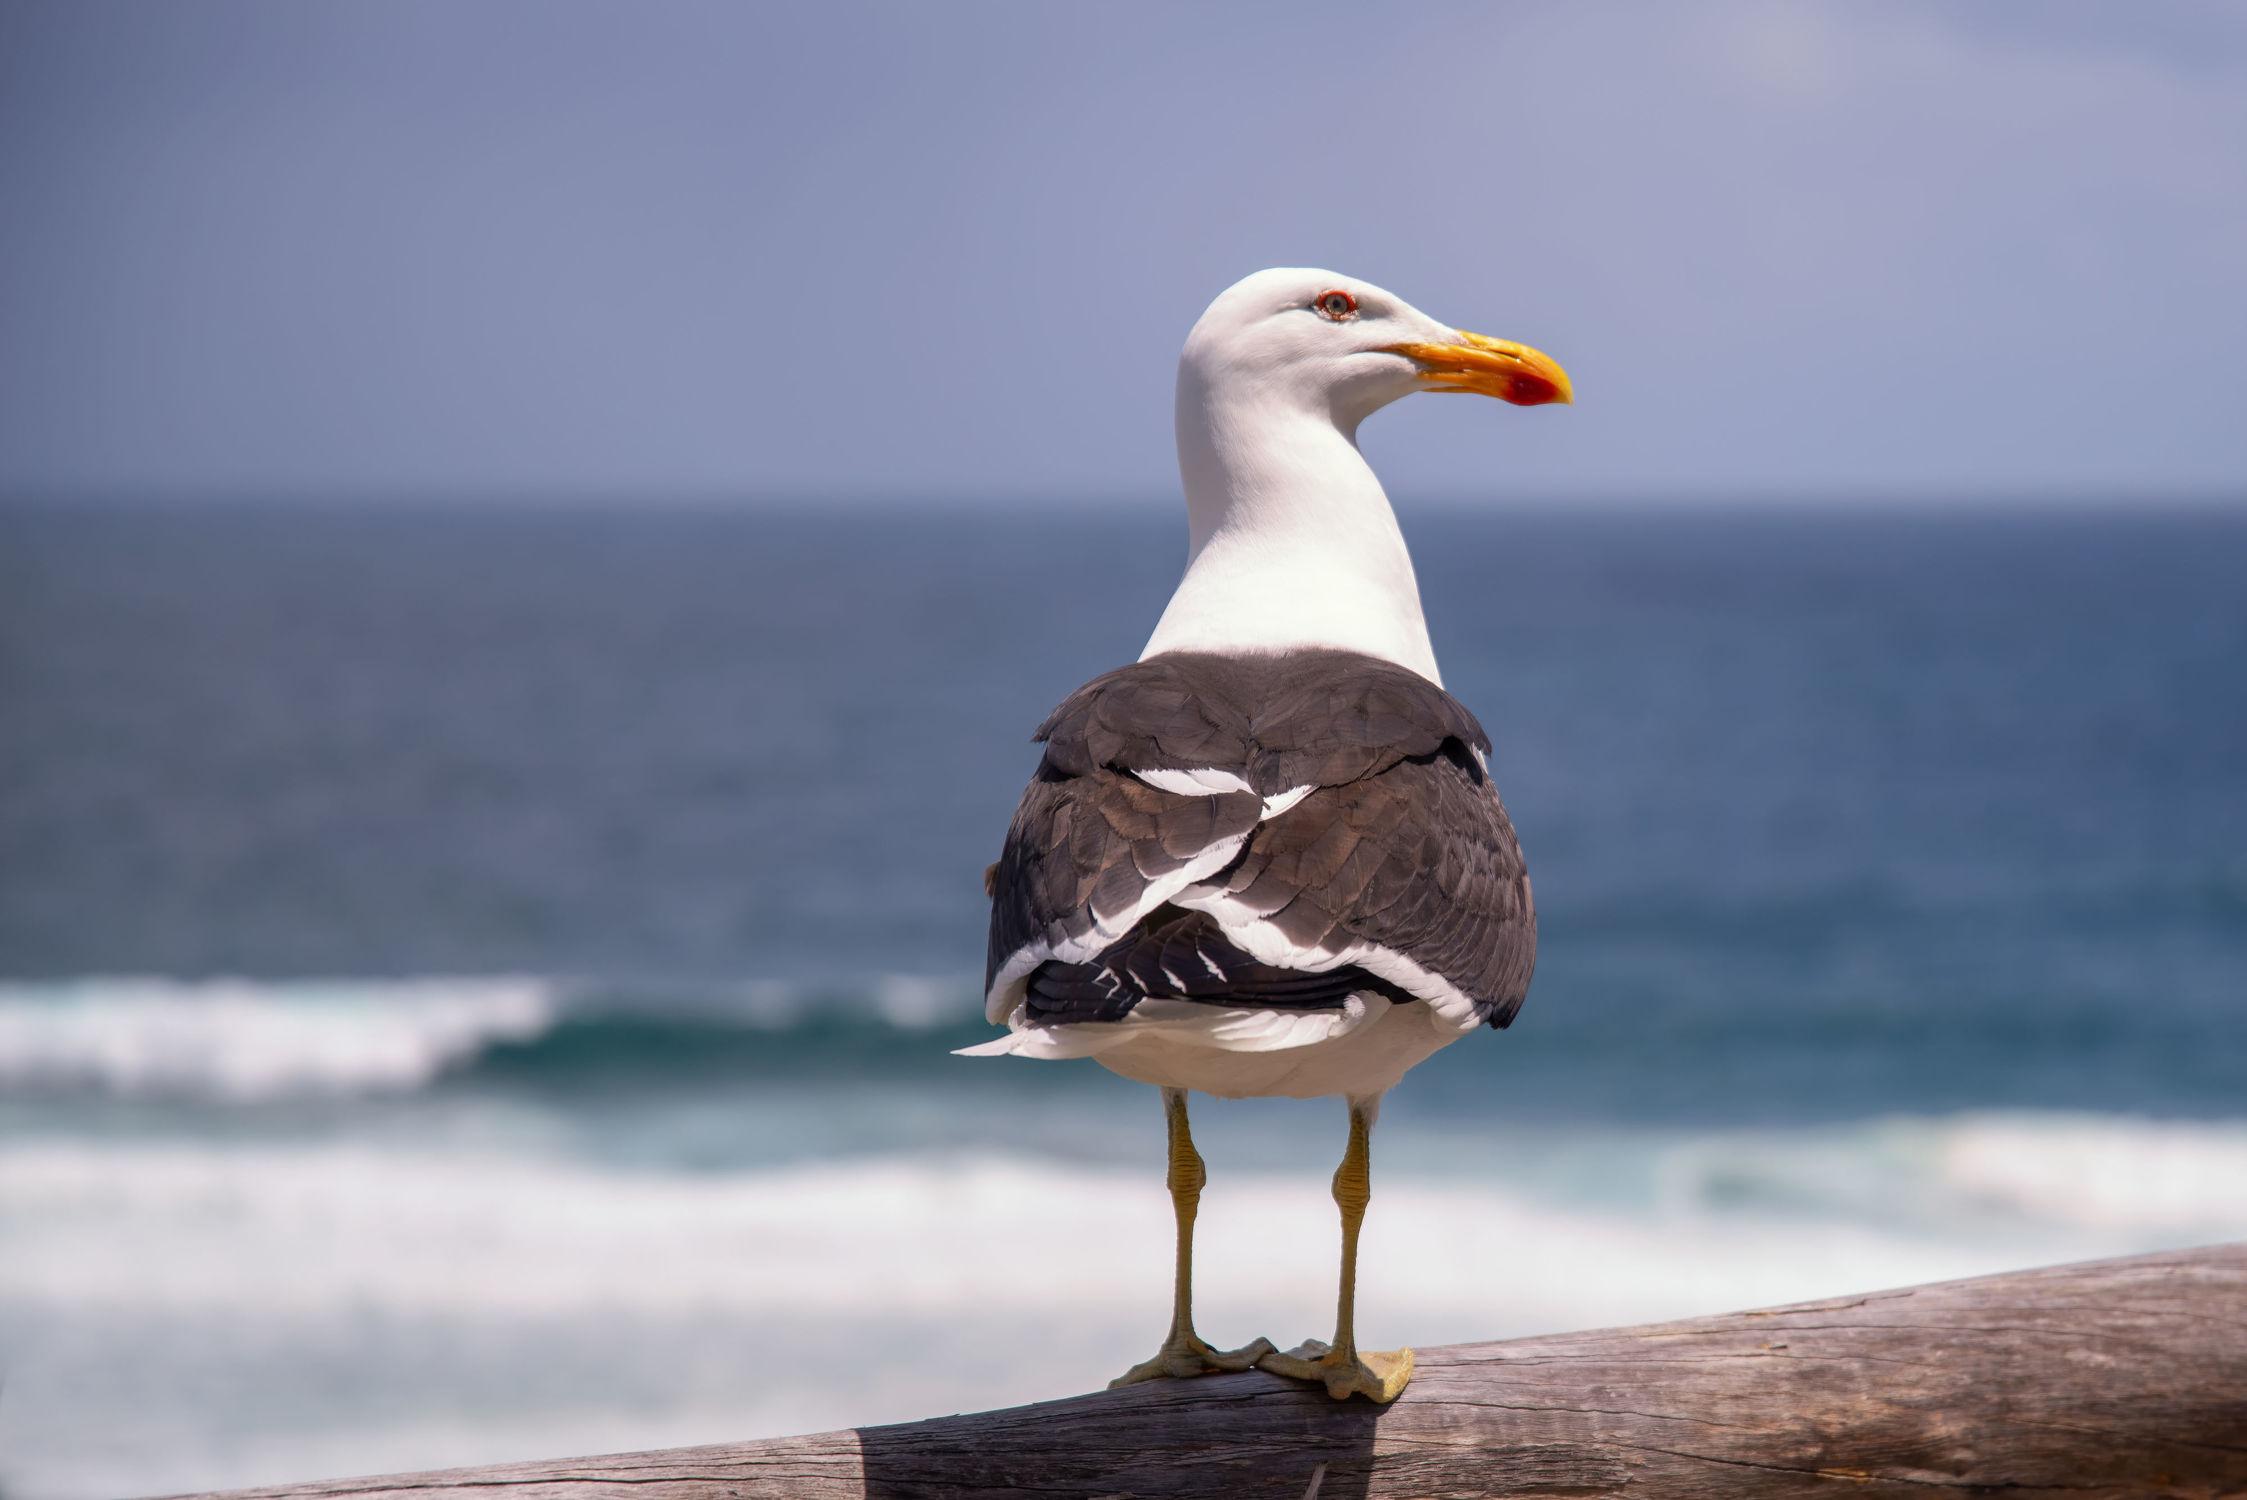 Bild mit Tiere, Natur, Vögel, Wasservögel, Raubvögel, Federn, Strand, Möwe, Küste, Auge, Blick, Schnabel, Gefieder, Jagd, Beute, neugierig